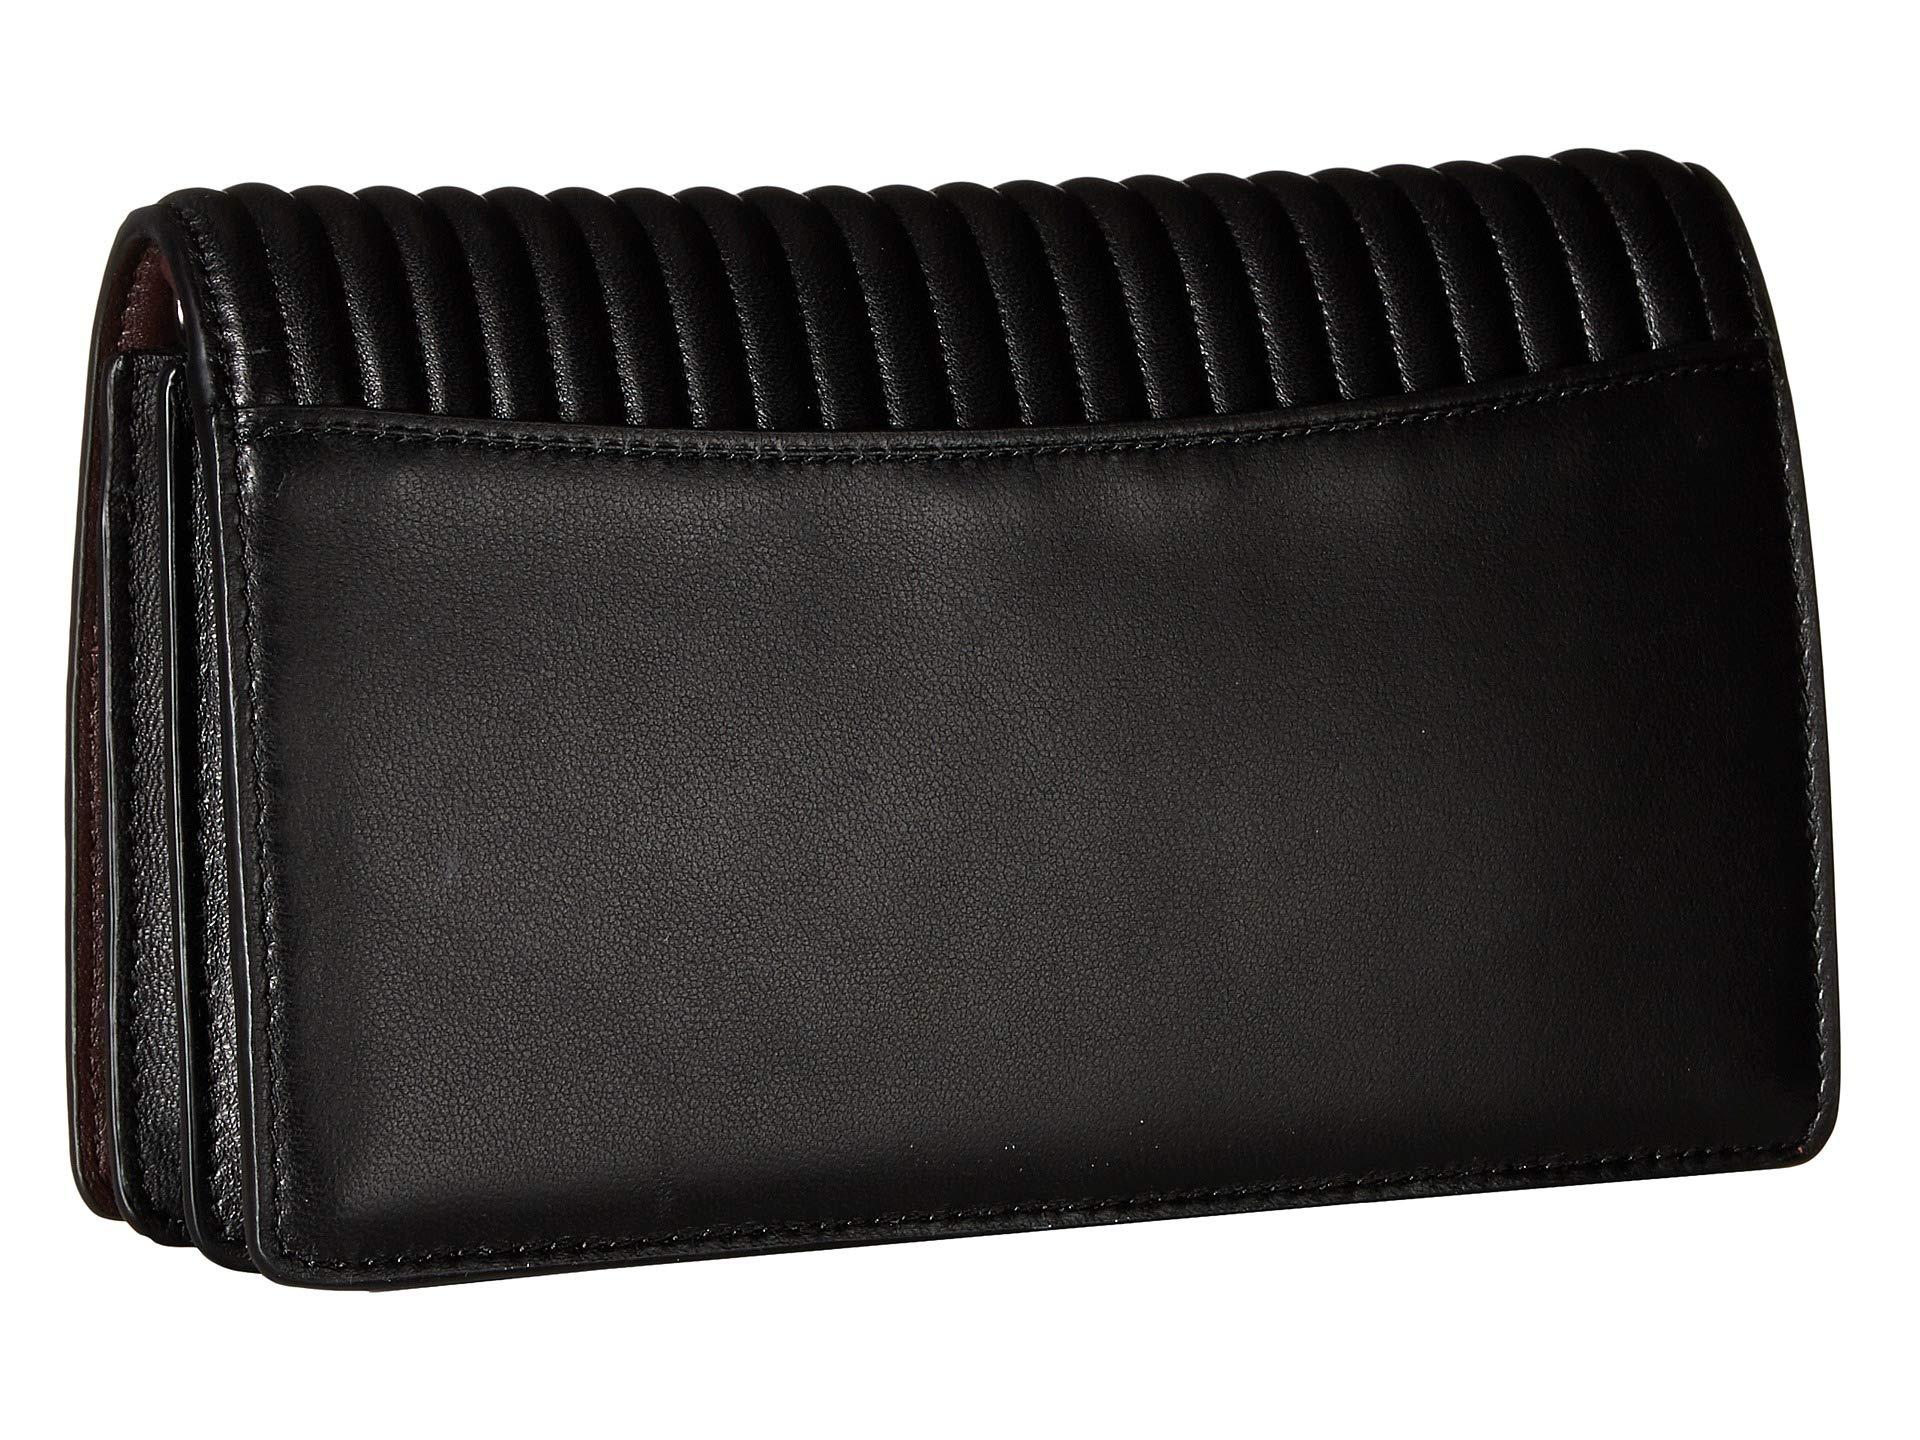 over Fold Embellishment Coach Bp black In Crystal Chain Clutch A5nS6wPqT